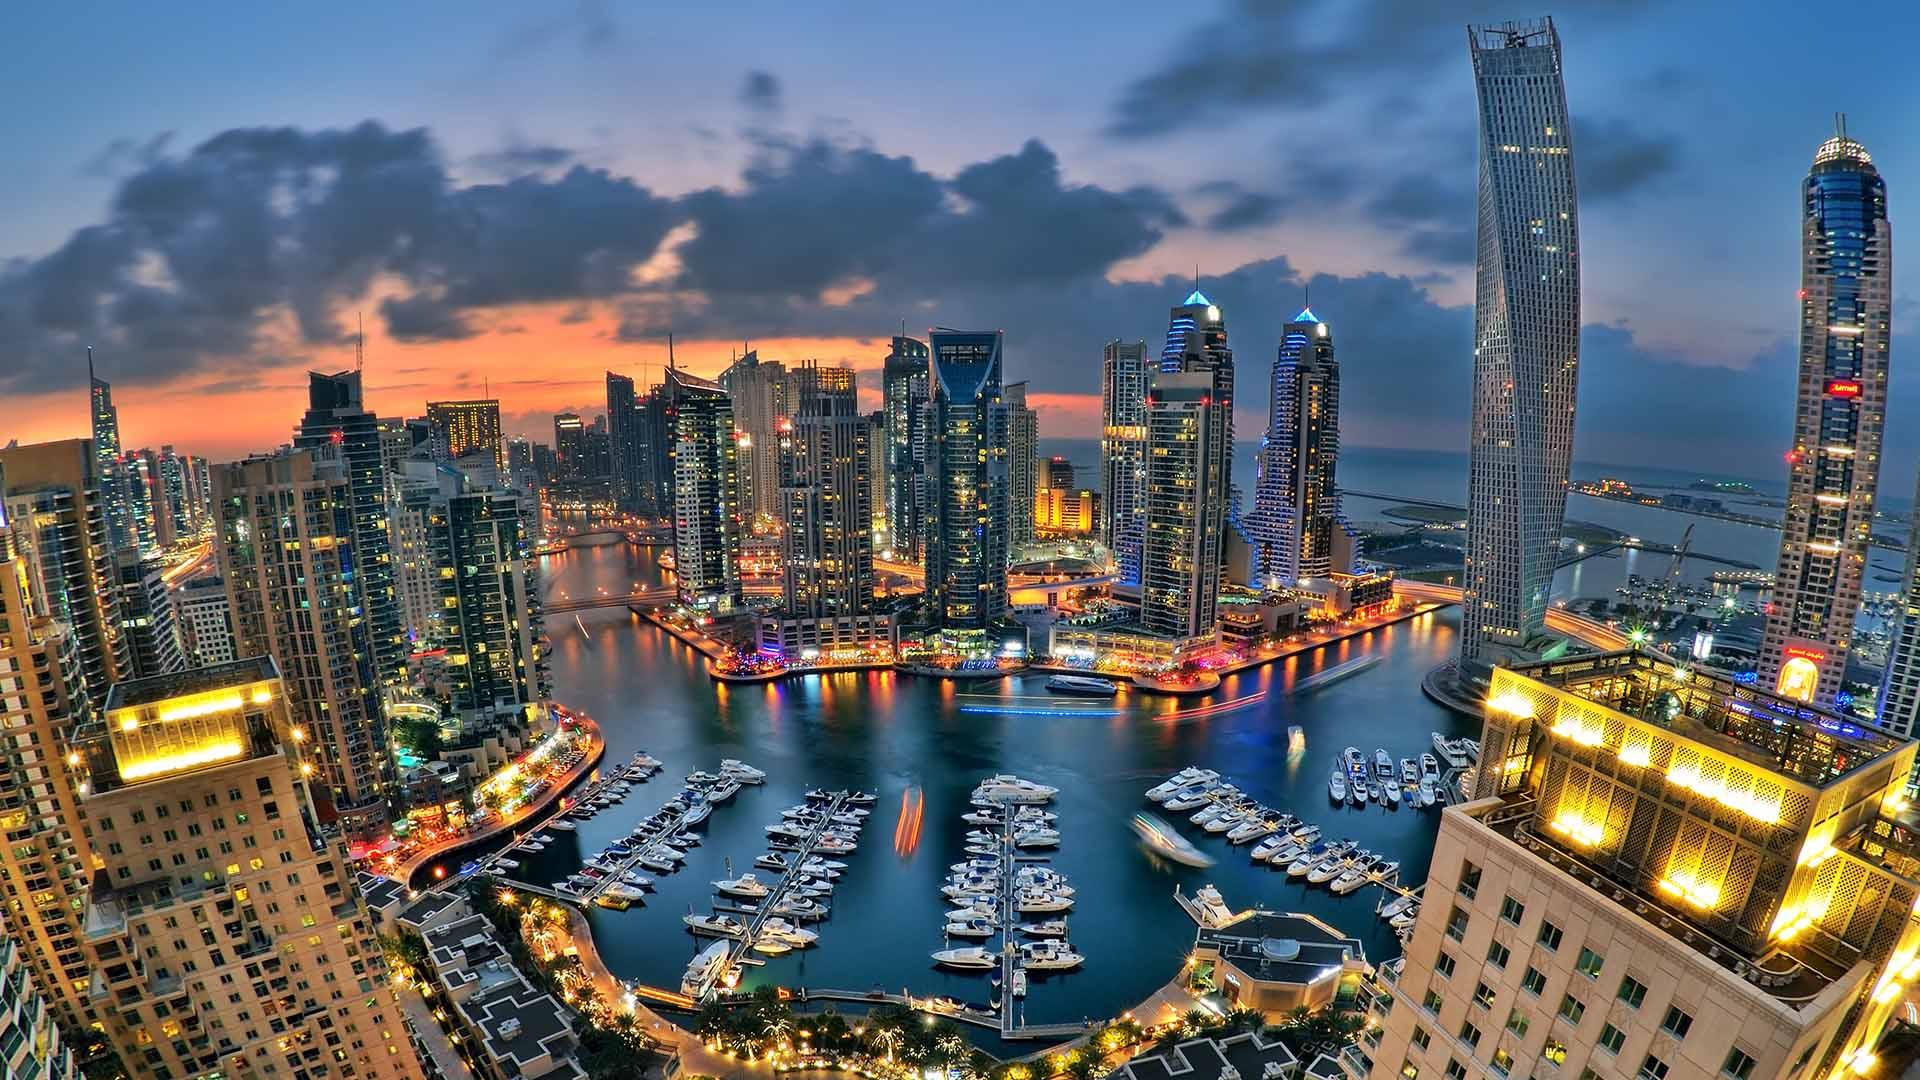 Dubai Marina - 9